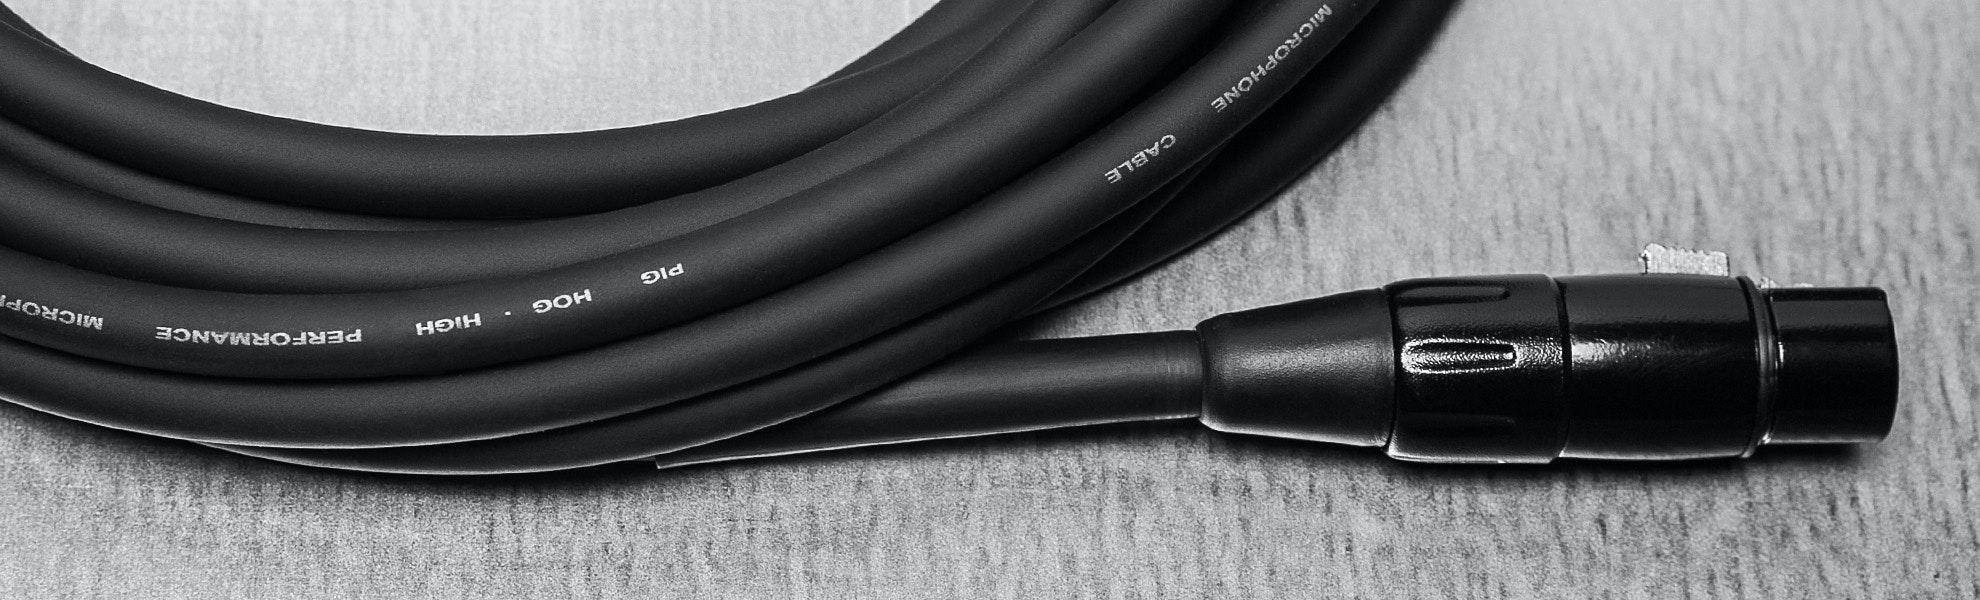 Pig Hog XLR Microphone Cables